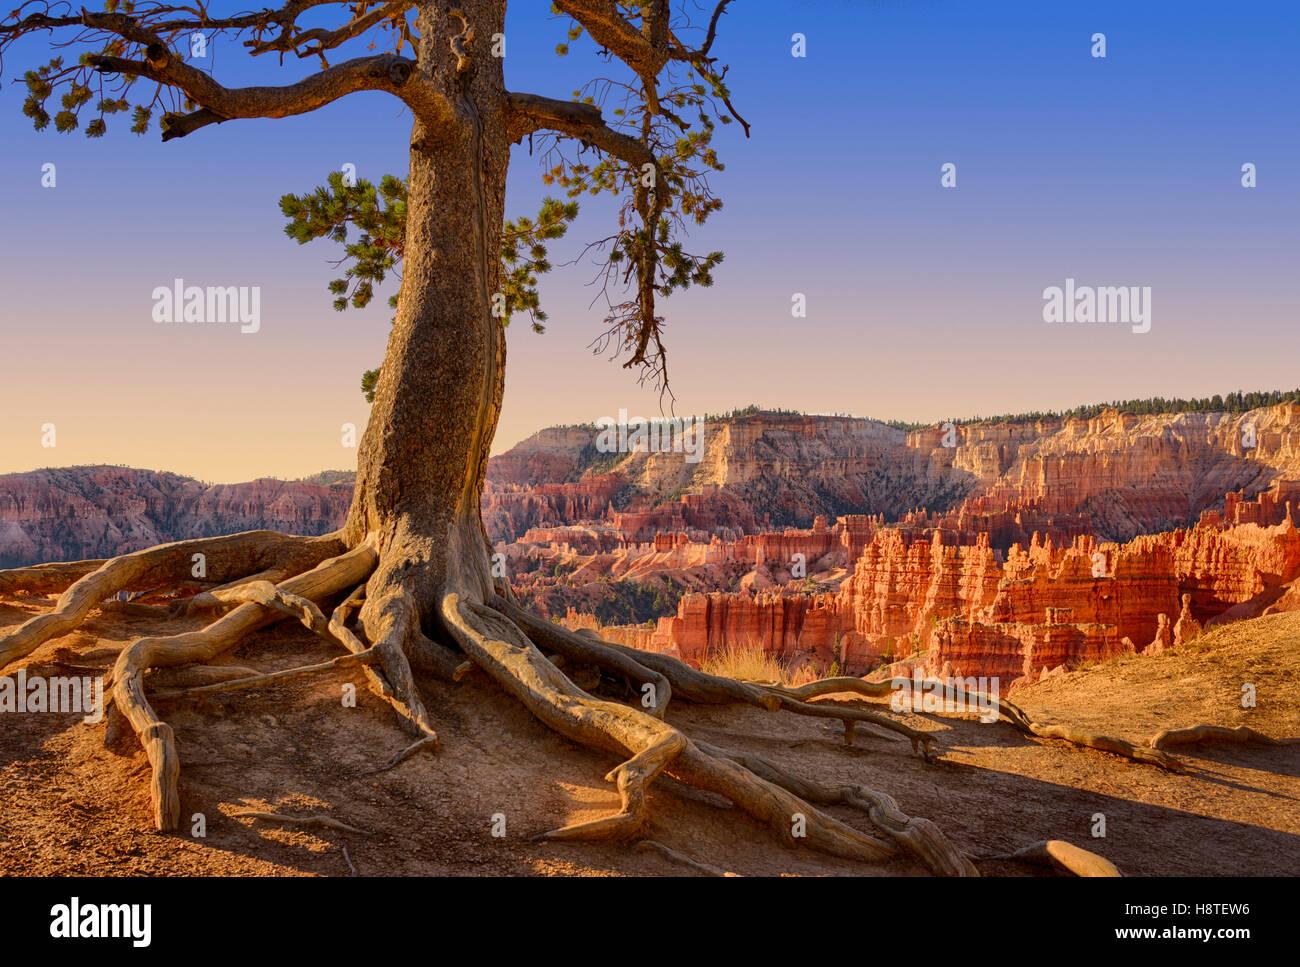 Pine Tree erhält einen Griff auf den Canyon Rand. Bryce Canyon National Park, Utah, USA Stockbild